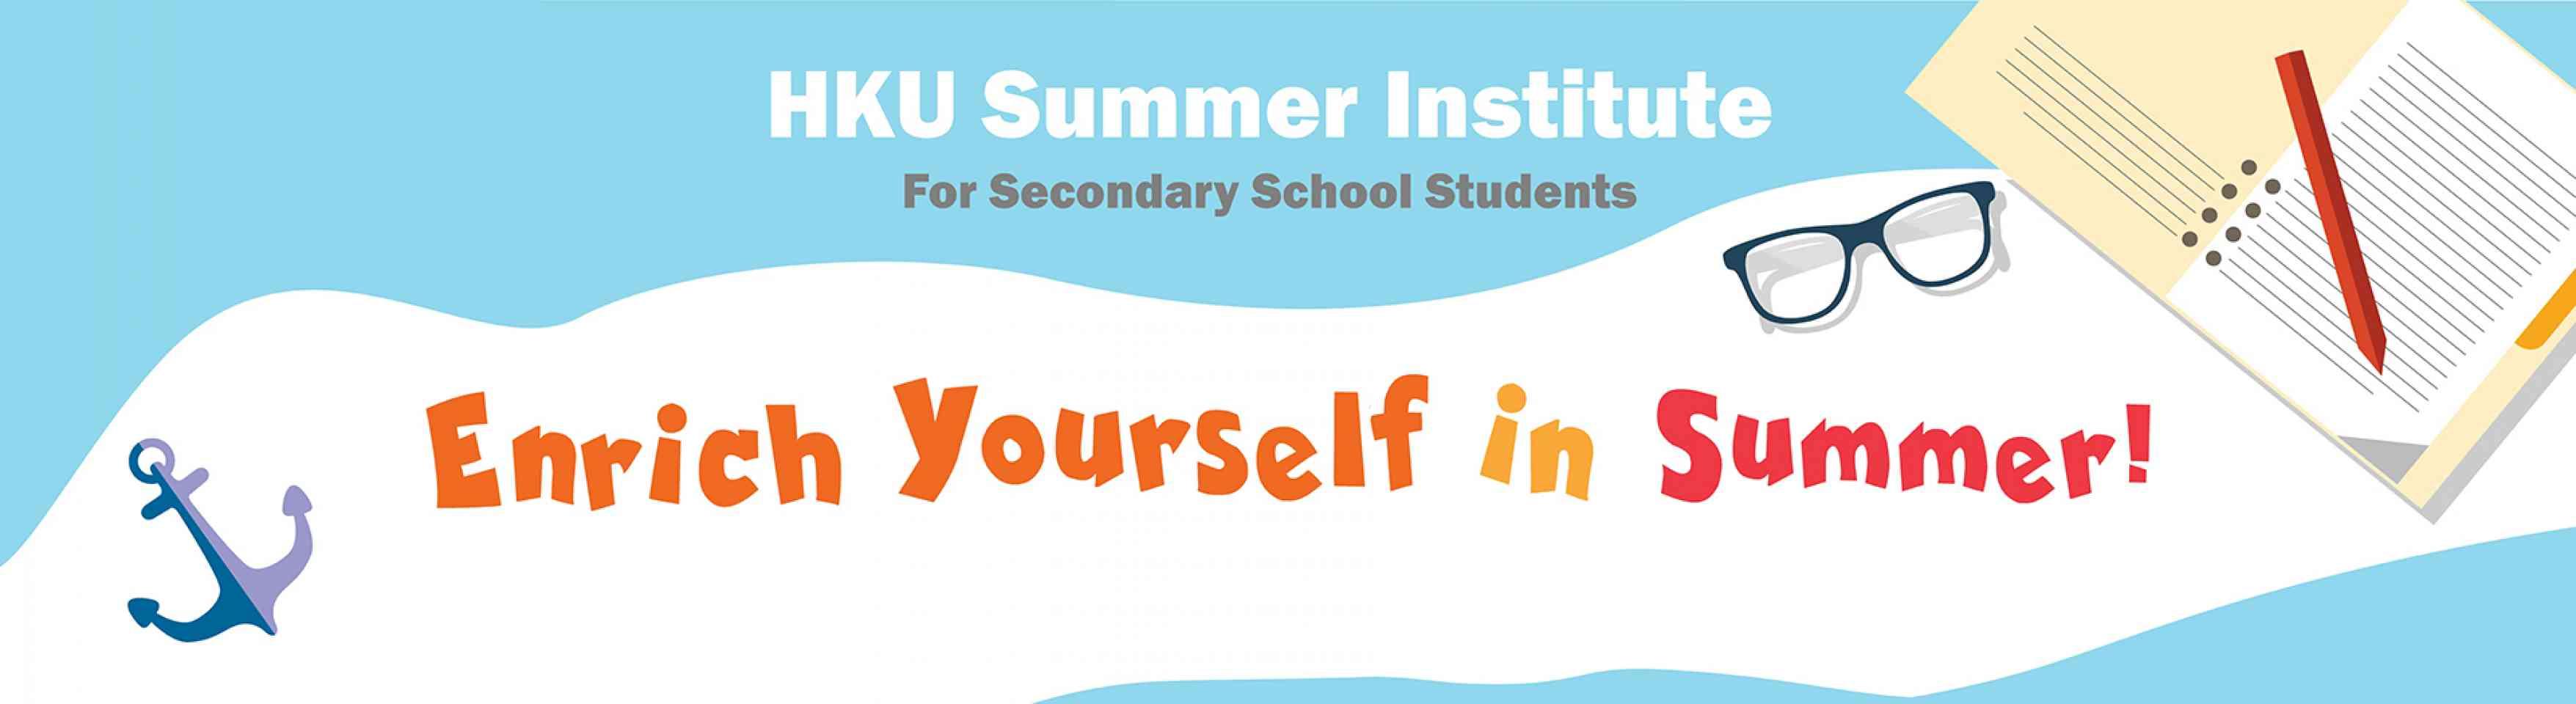 HKU Summer Programme 2017